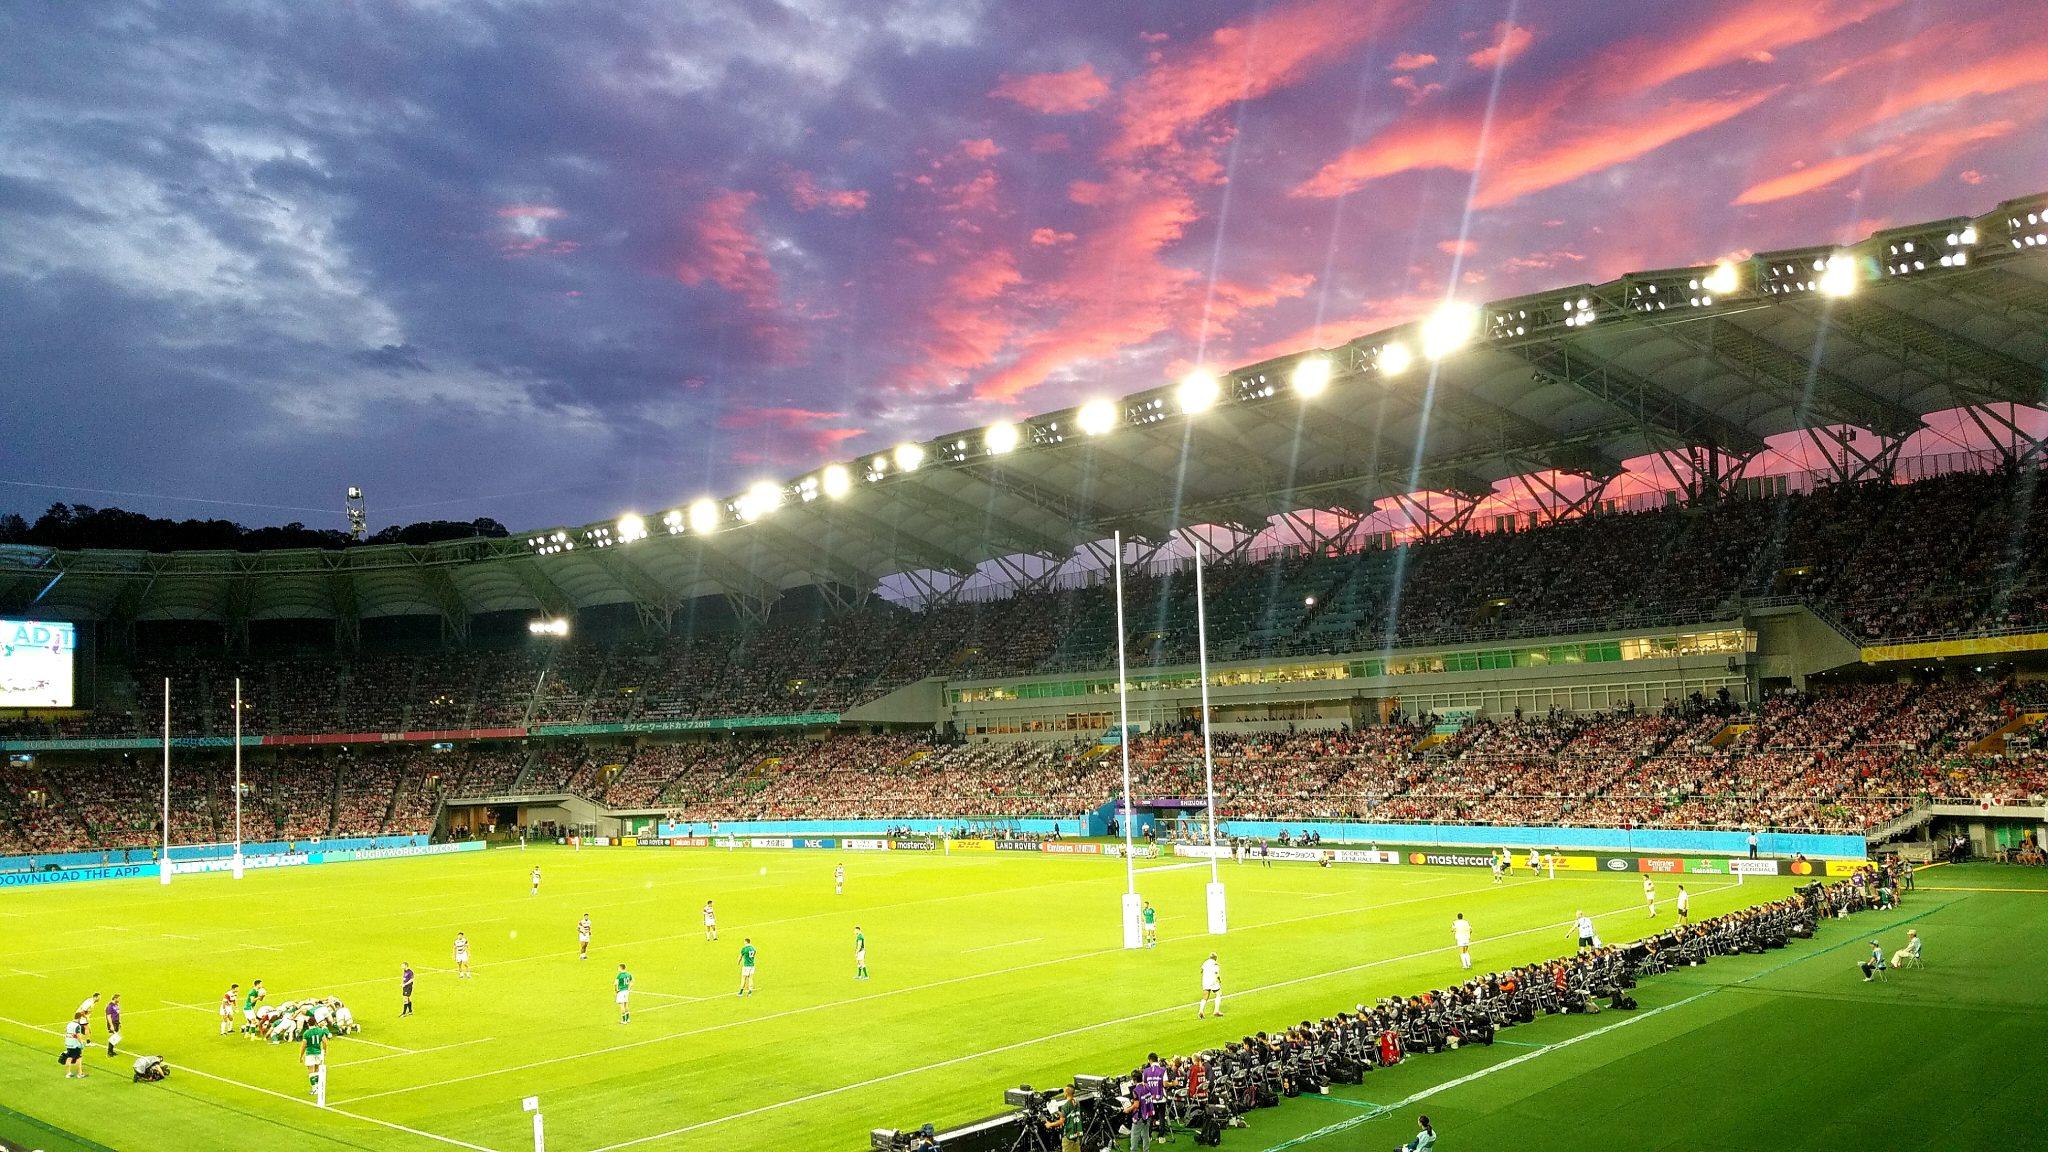 Shizuoka Stadium Ecopa on 28 September 2019 during the match when Japan beat Ireland 19-12